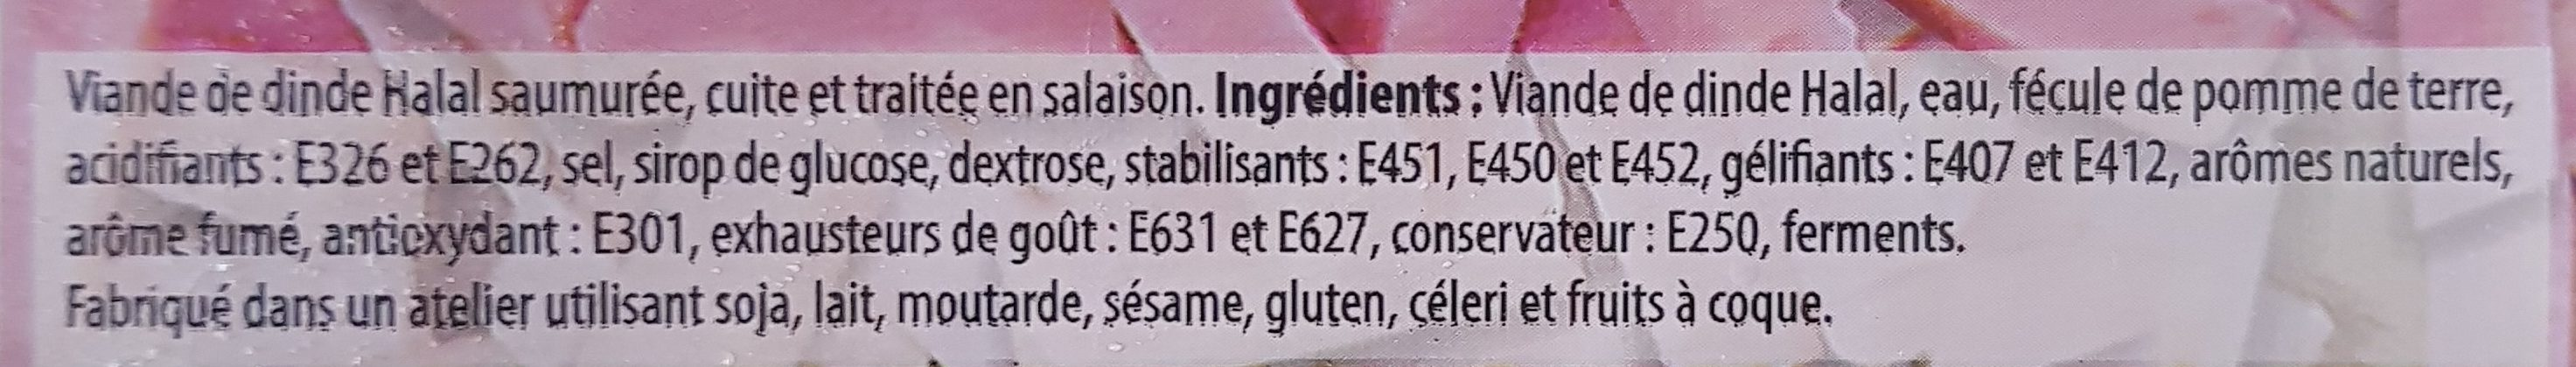 Allumettes de Dinde - Ingrediënten